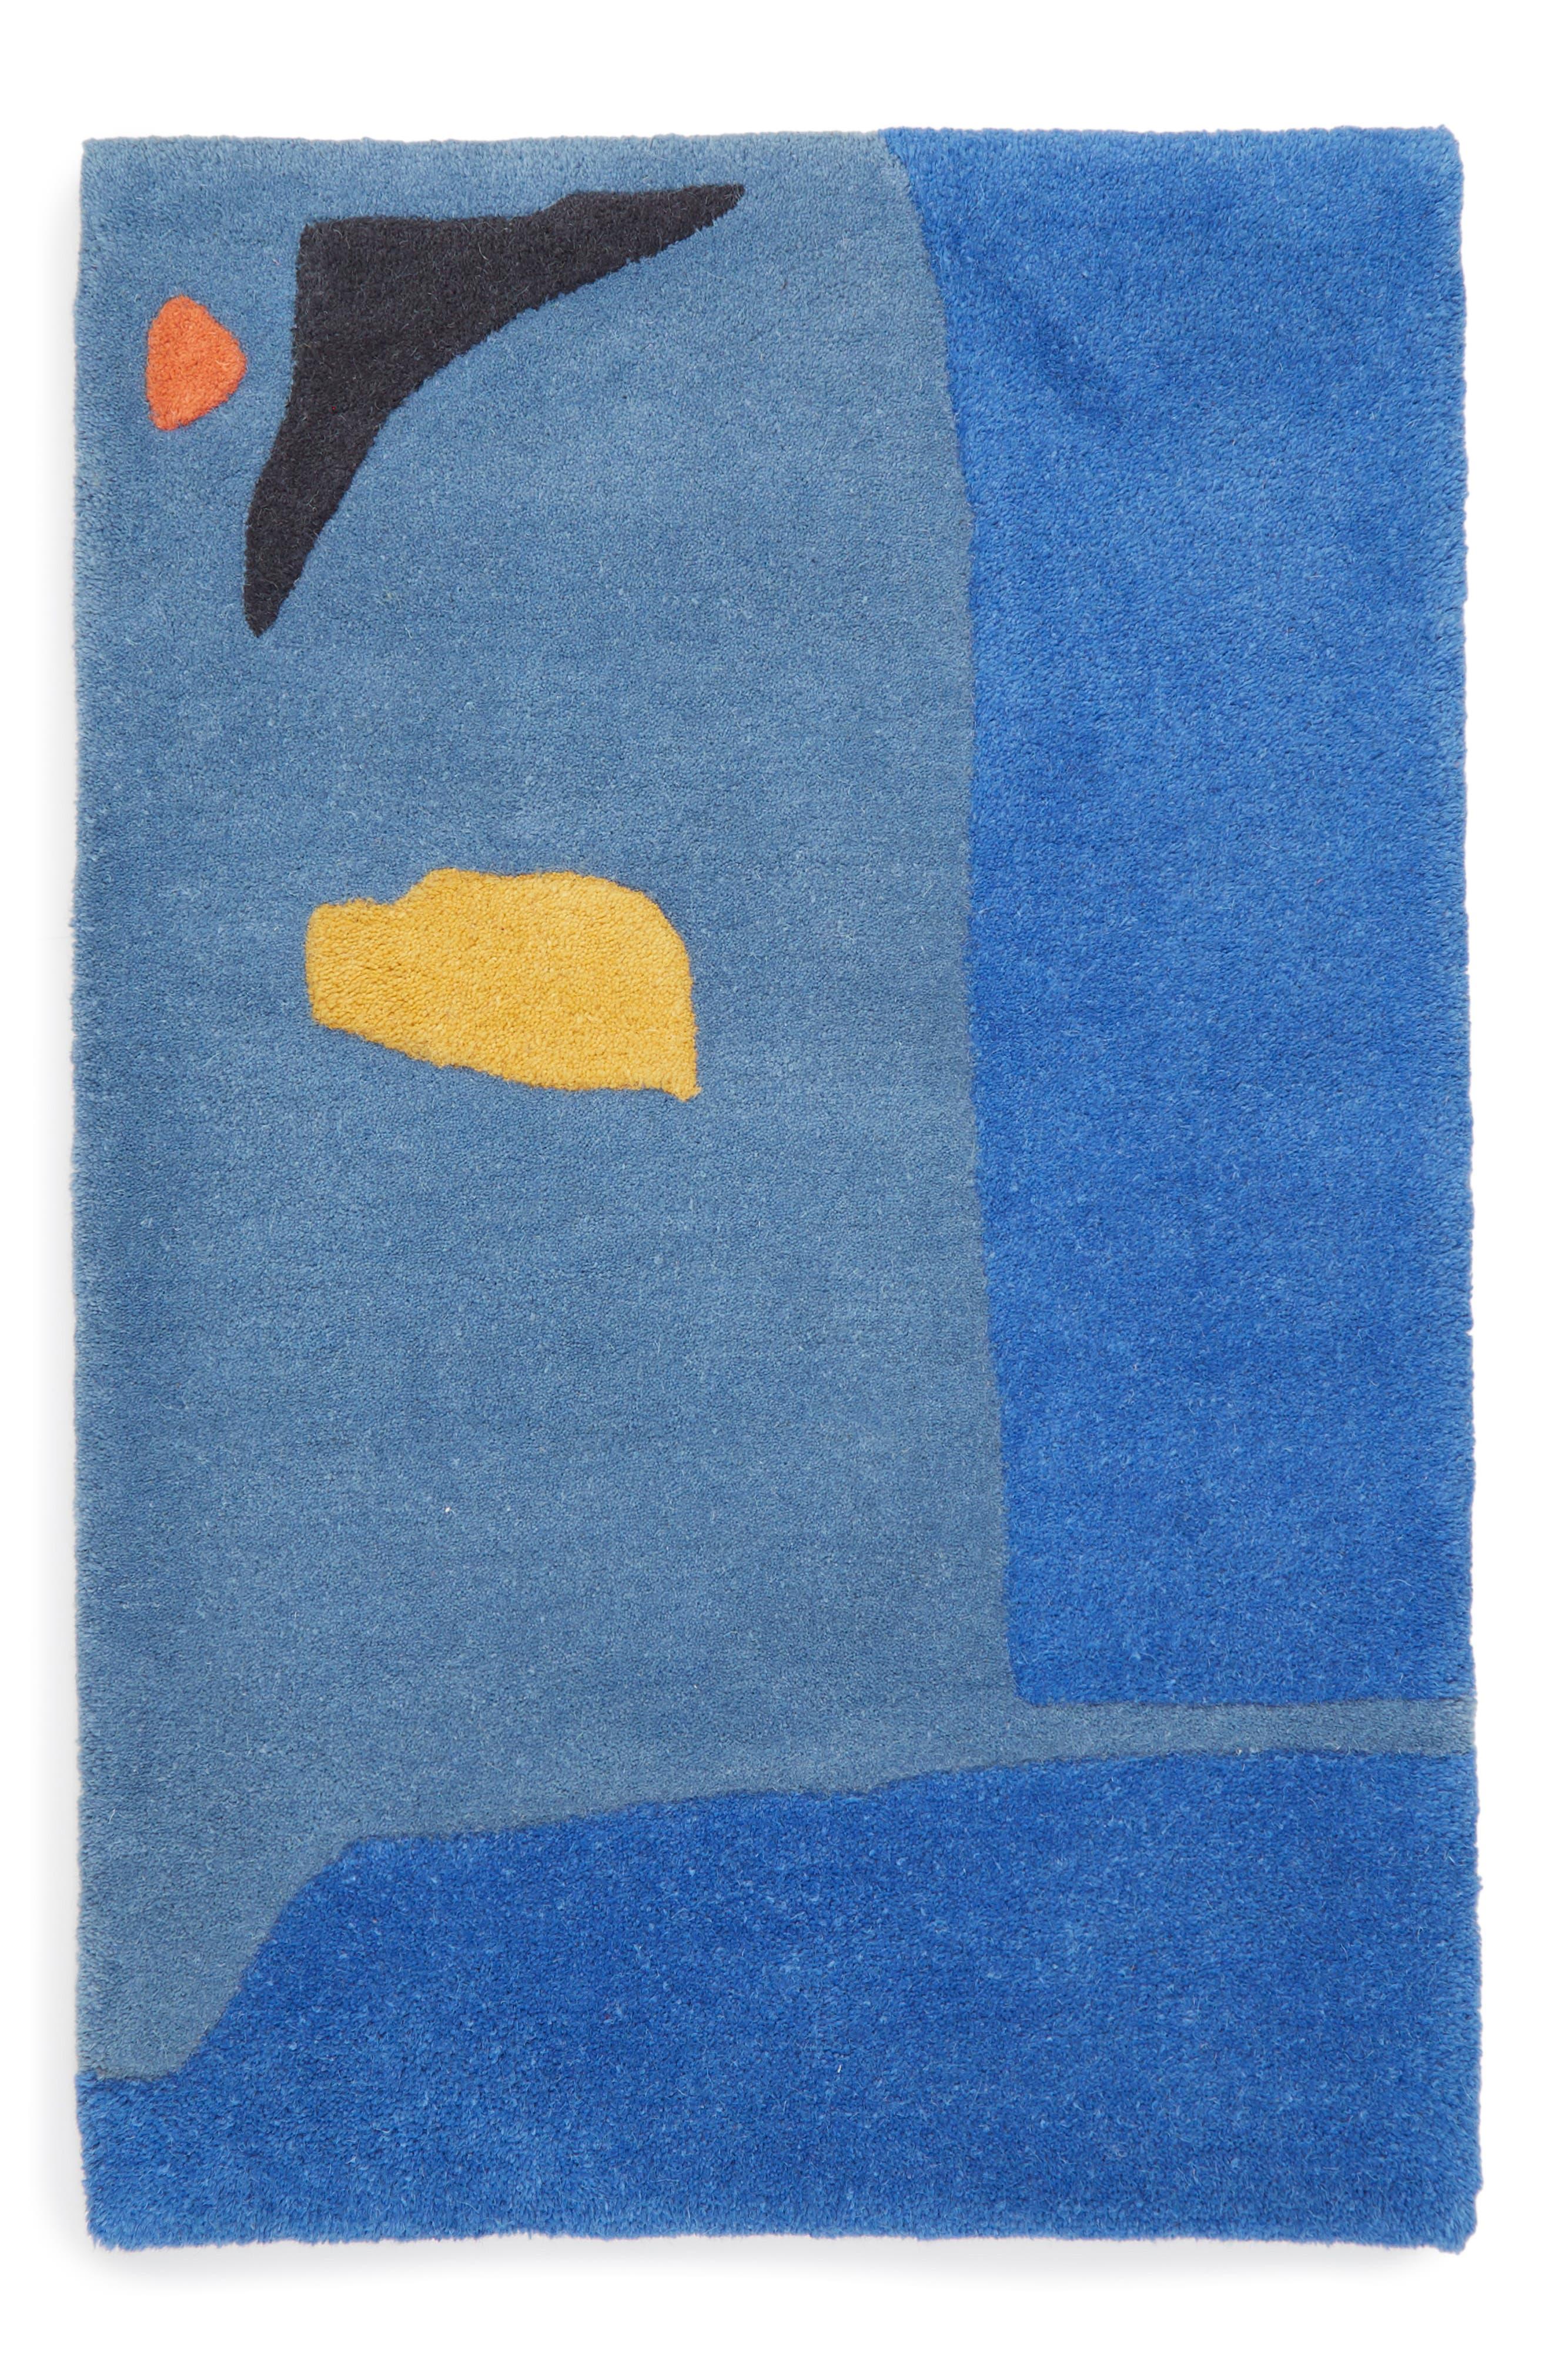 The Little Stranger Hand Tufted Wool Rug,                         Main,                         color, BLUE